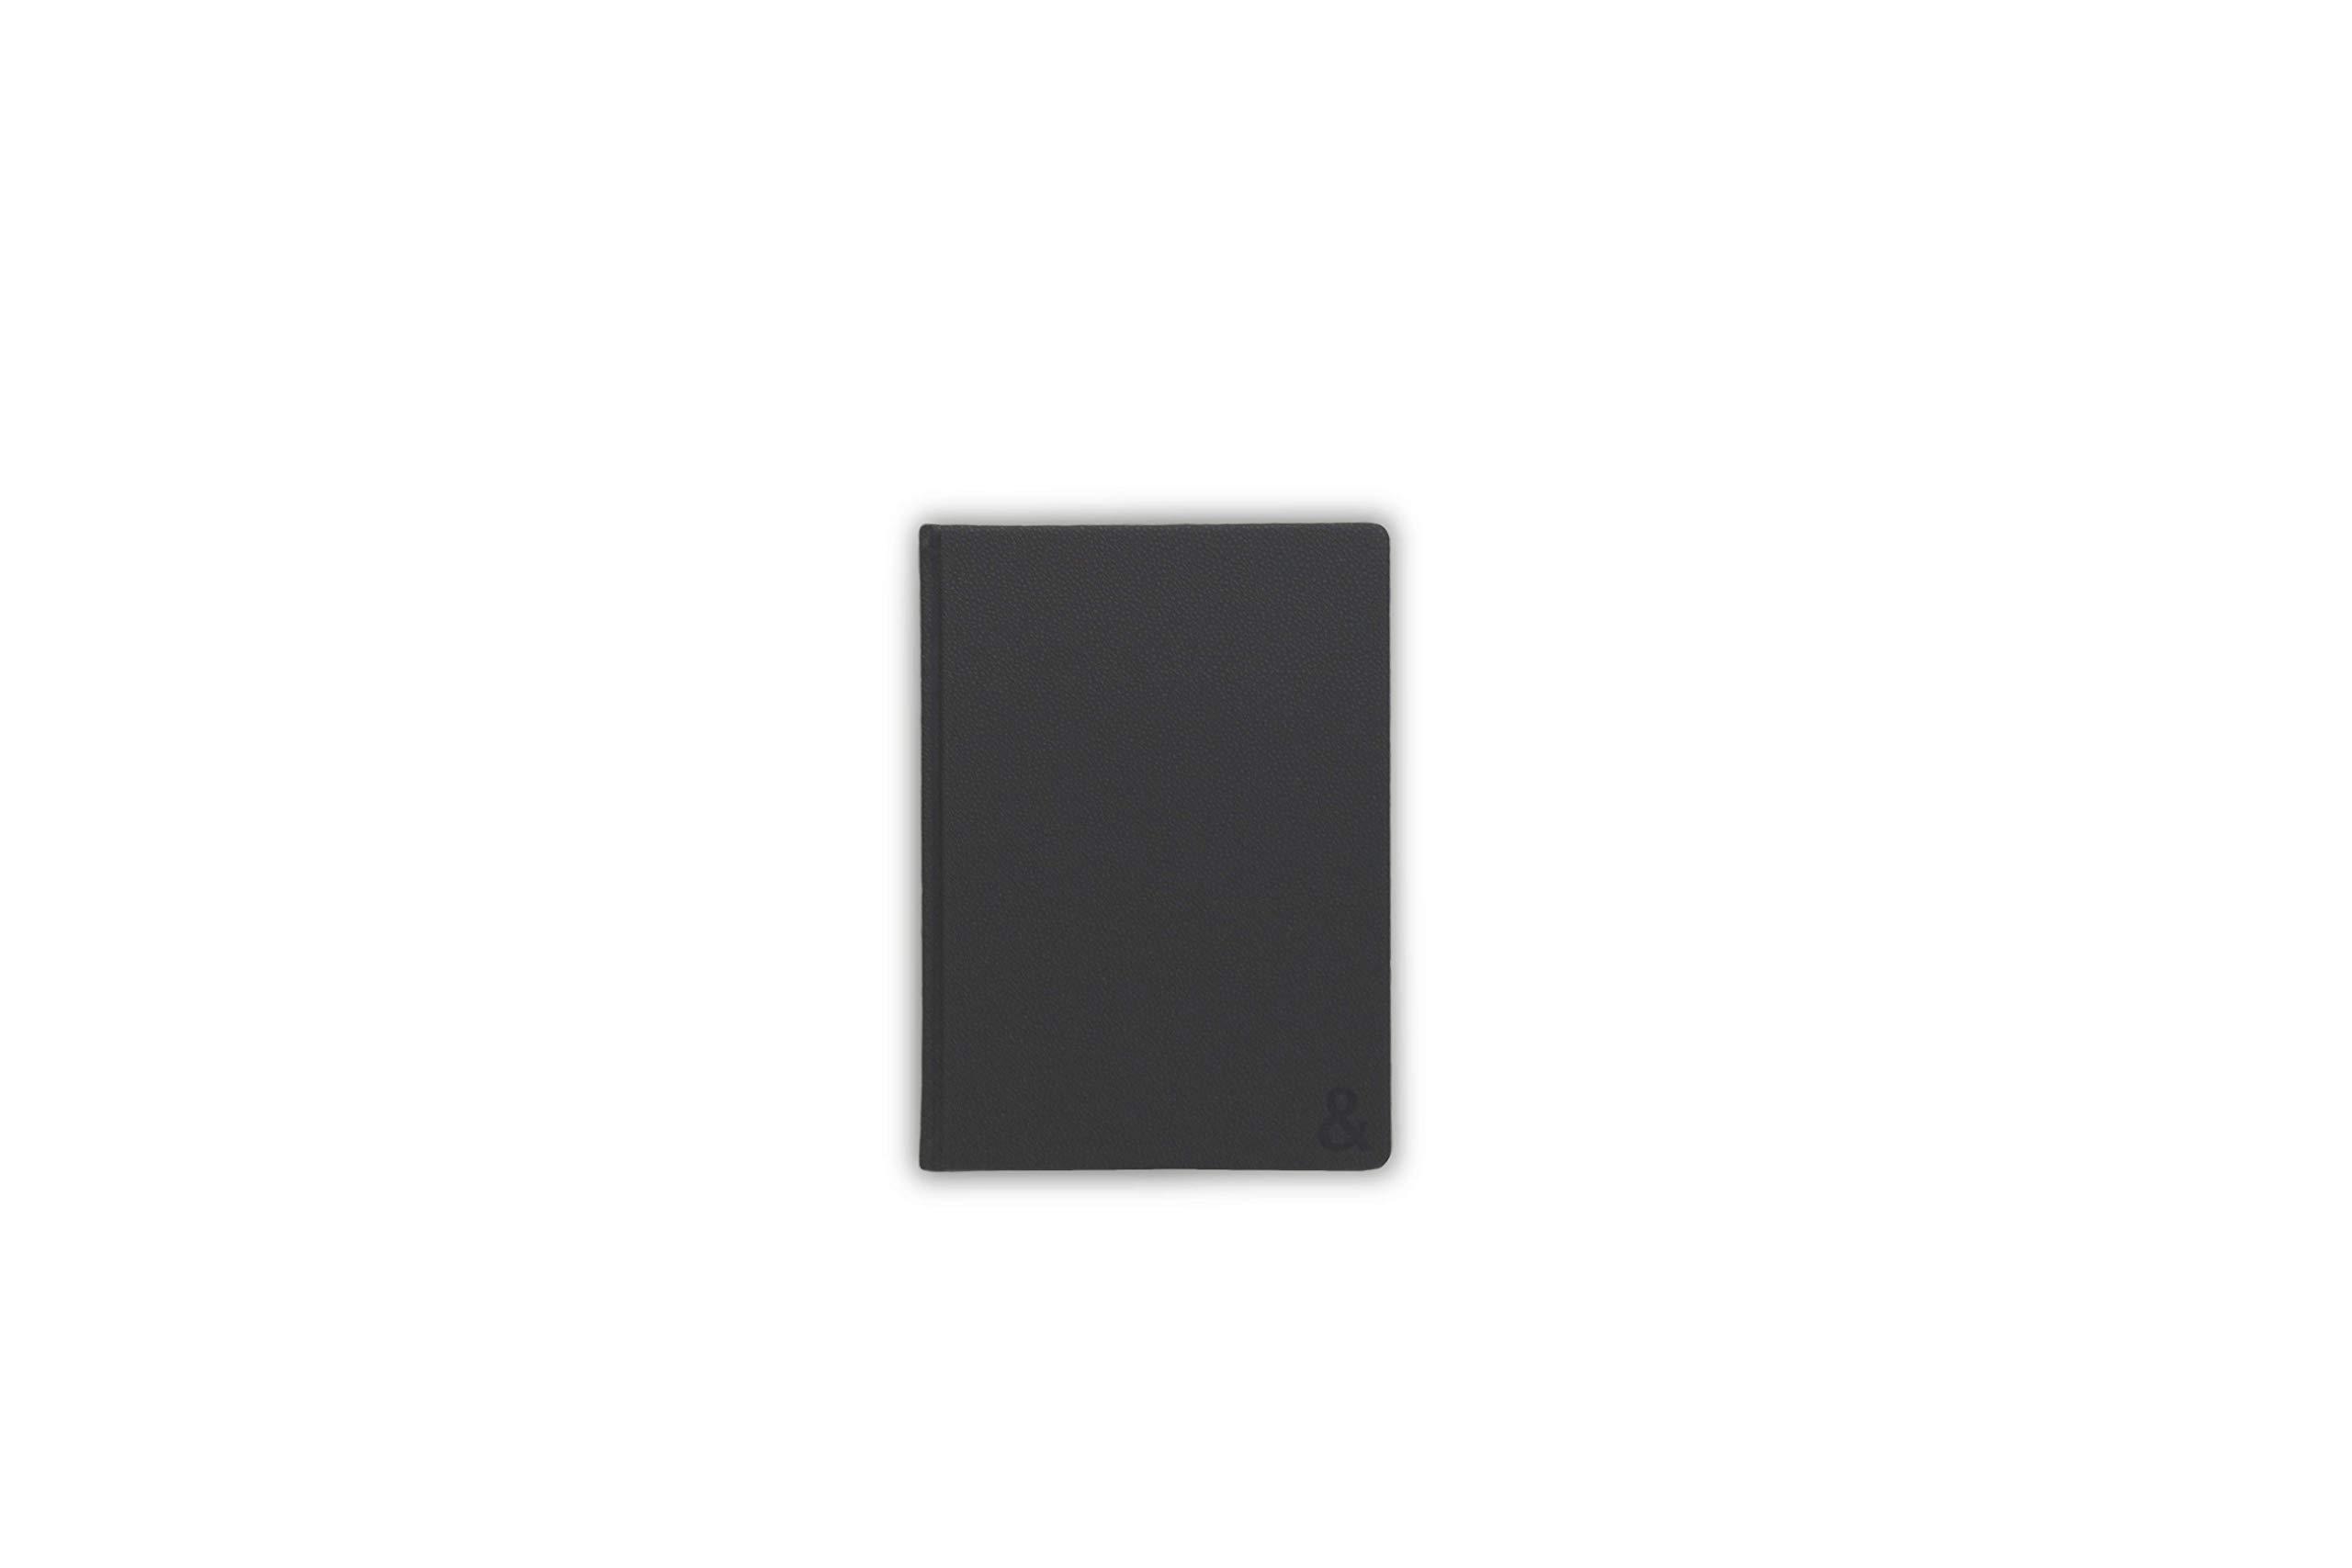 code&quill Origin Notebook Premium Hardcover Notebook for Creatives